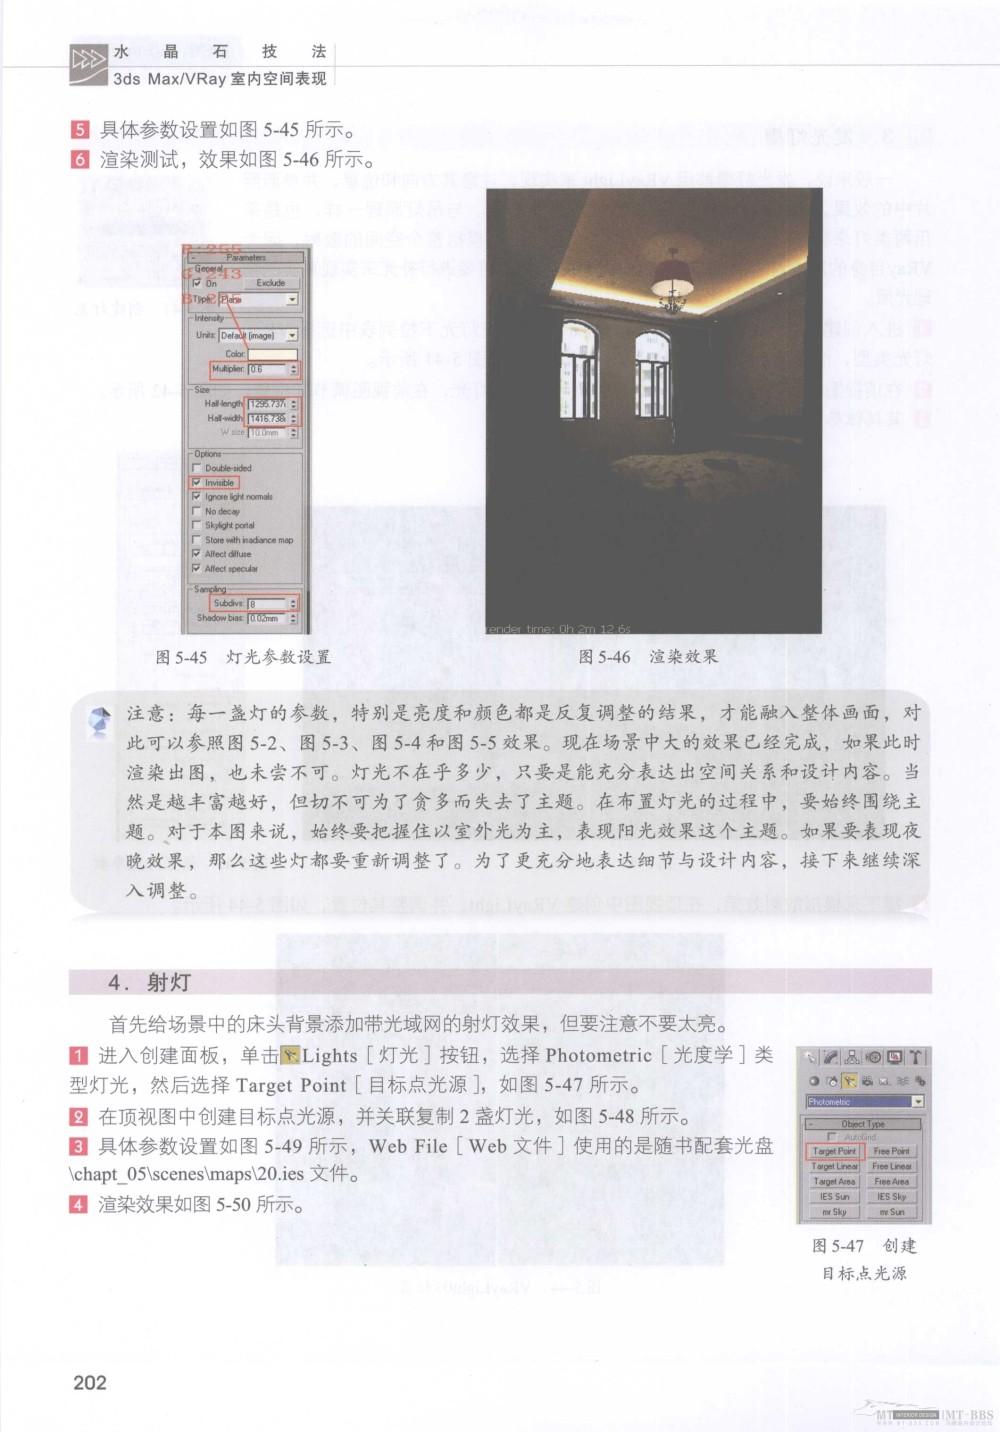 水晶石技法-3ds_Max&VRay室内空间表现_水晶石技法-3ds_Max&VRay室内空间表现_页面_208.jpg